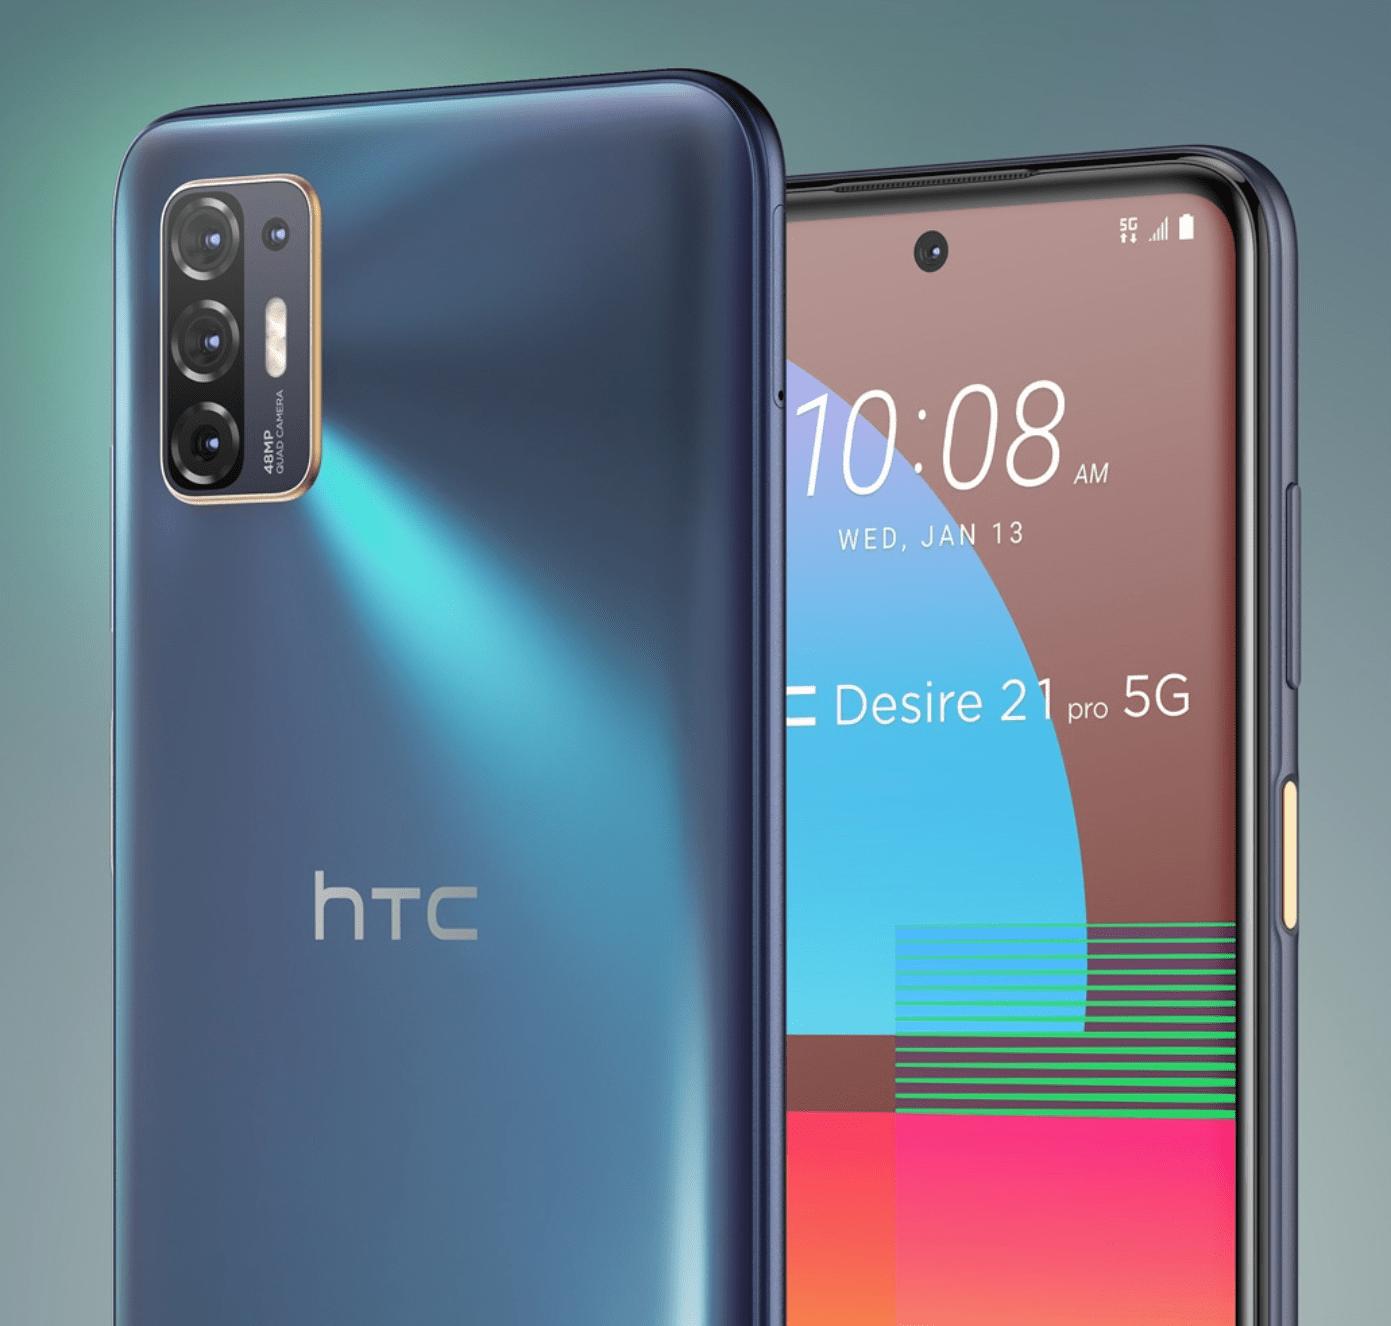 HTC announces the new Desire 21 Pro 5G